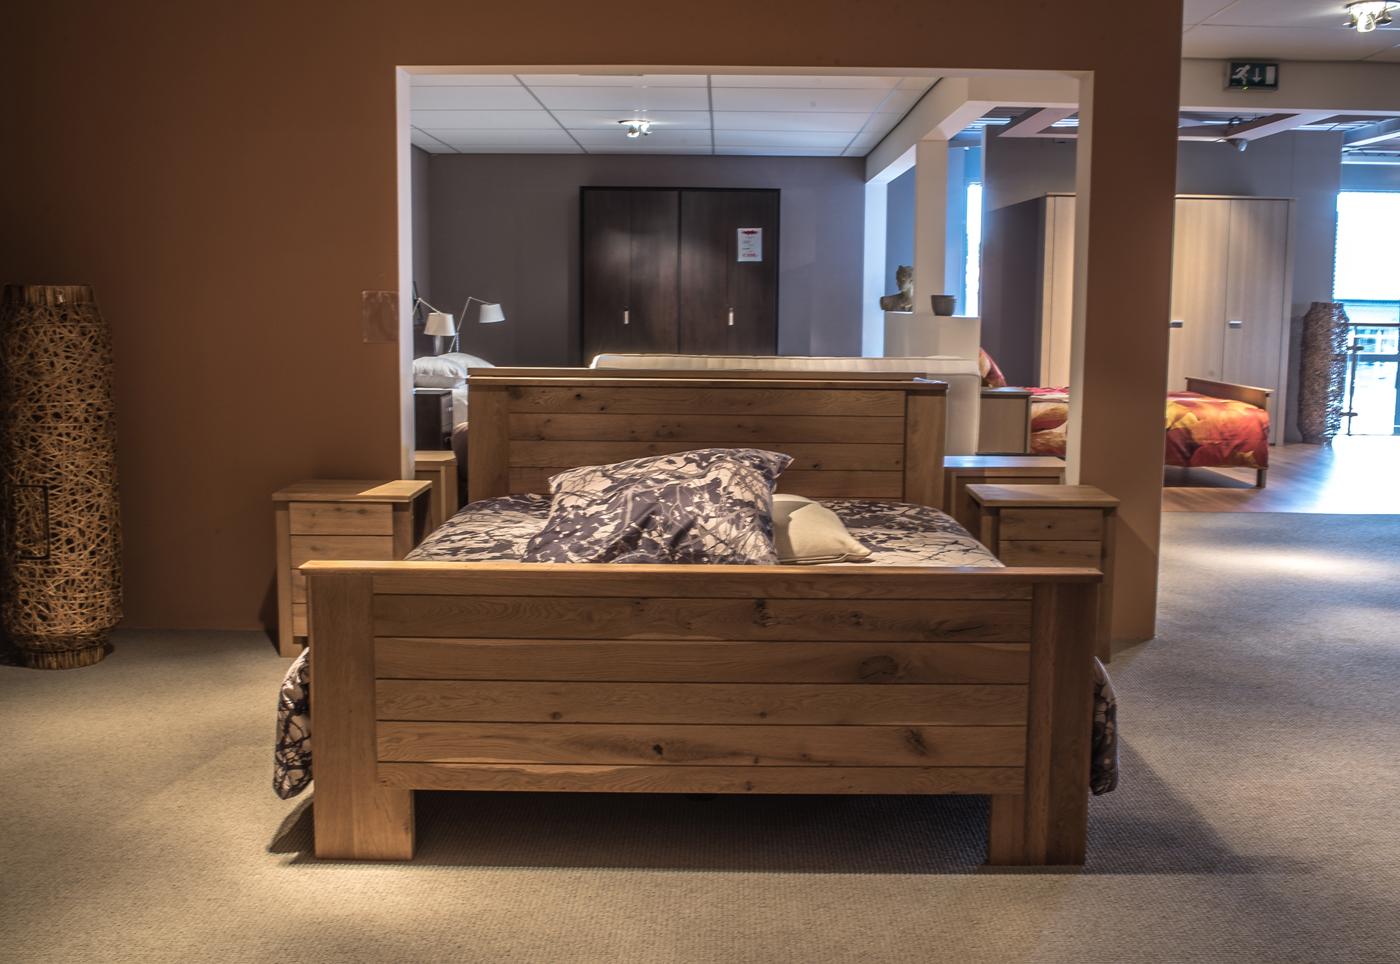 Slaapkamer Meubels Pimpen : Kamer pimpen latest kamer pimpen with kamer pimpen perfect bij